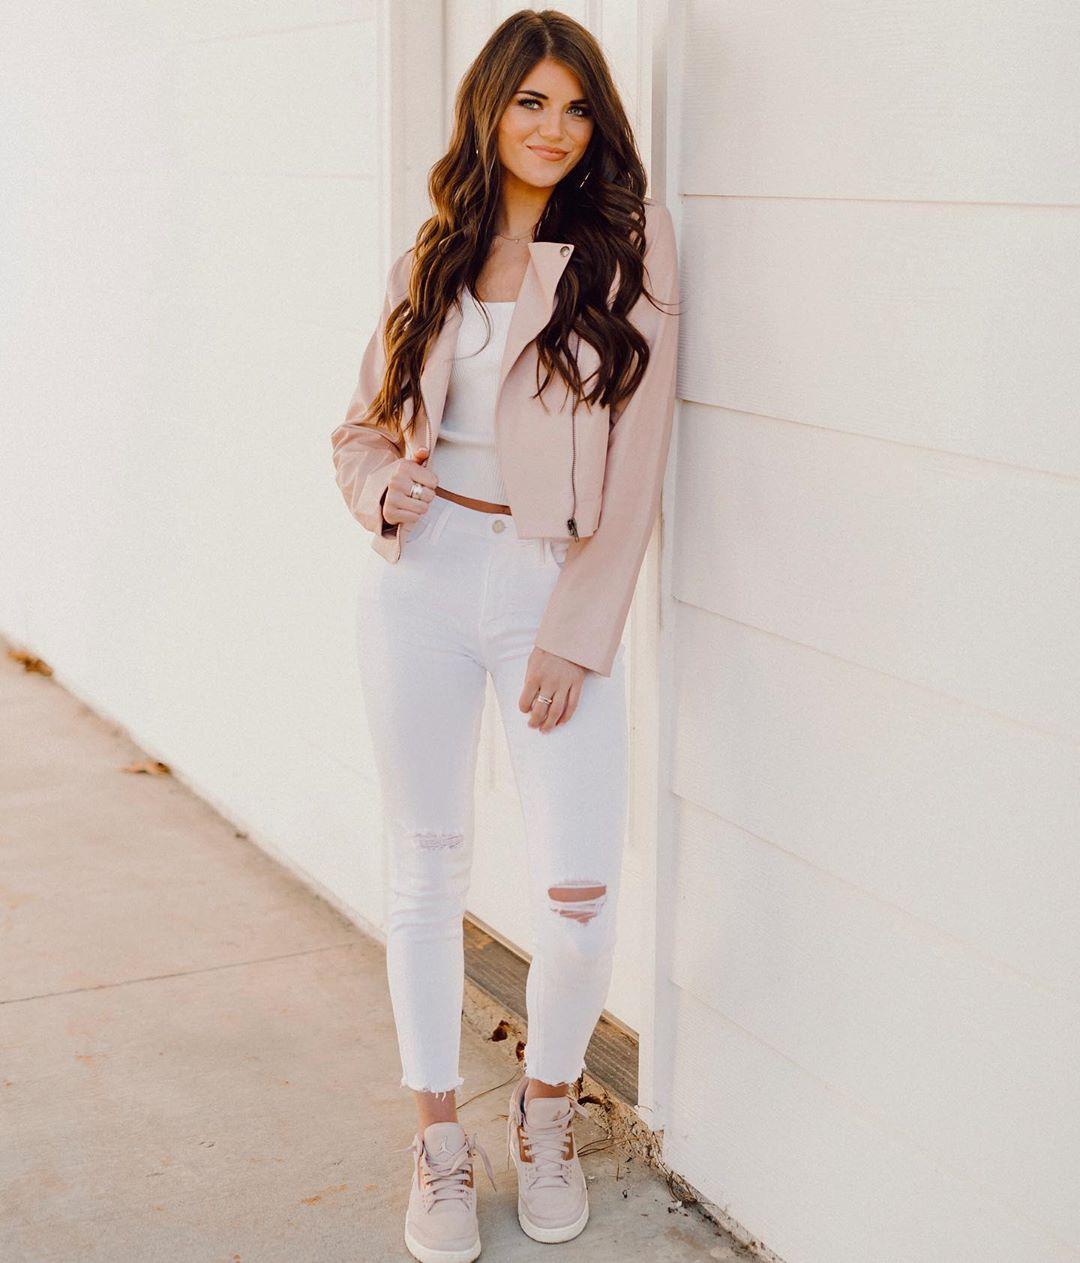 Madison Prewett